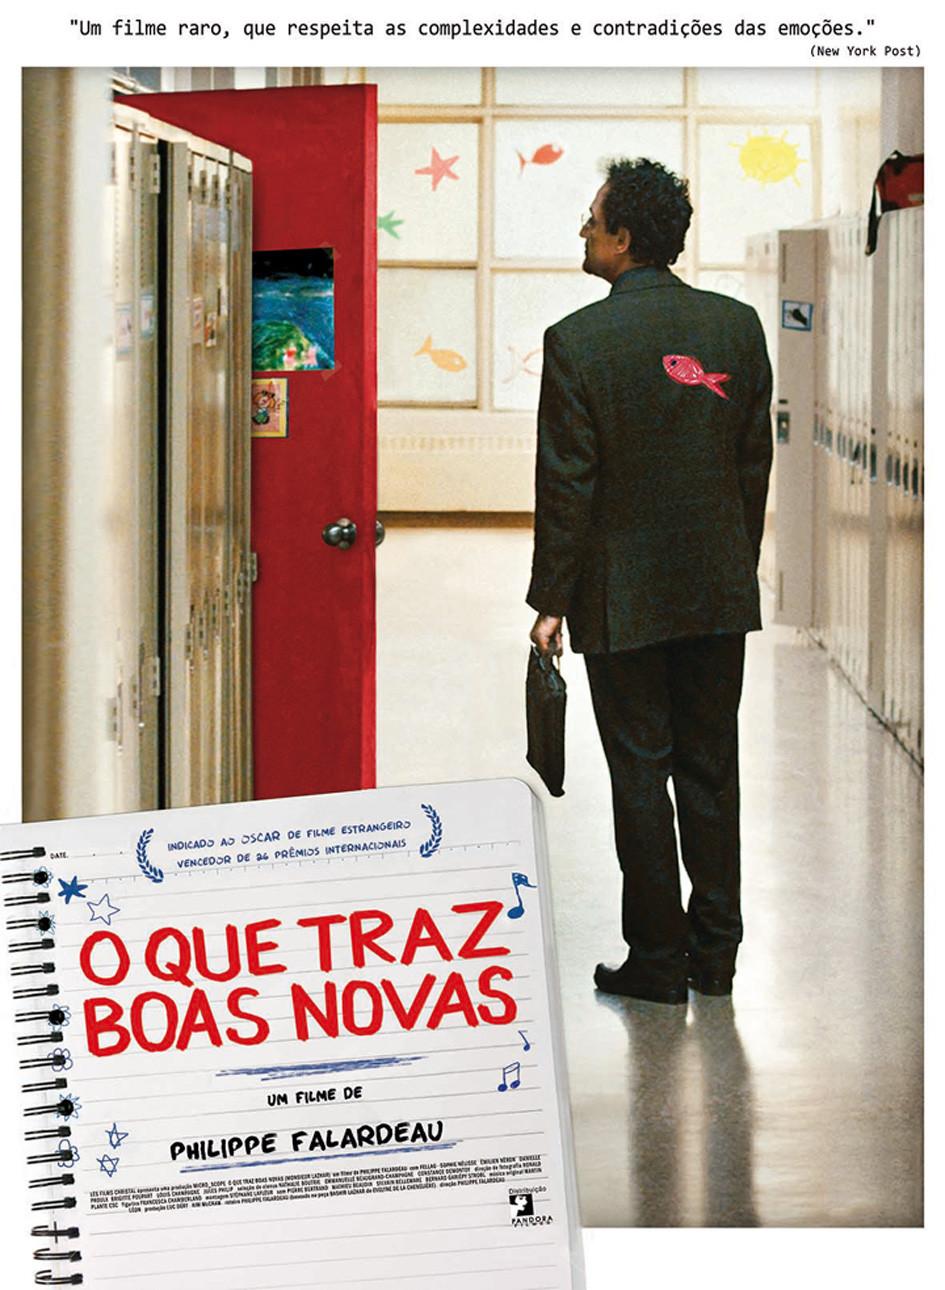 O Que Traz Boas Novas (Monsieur Lazhar: 2011)